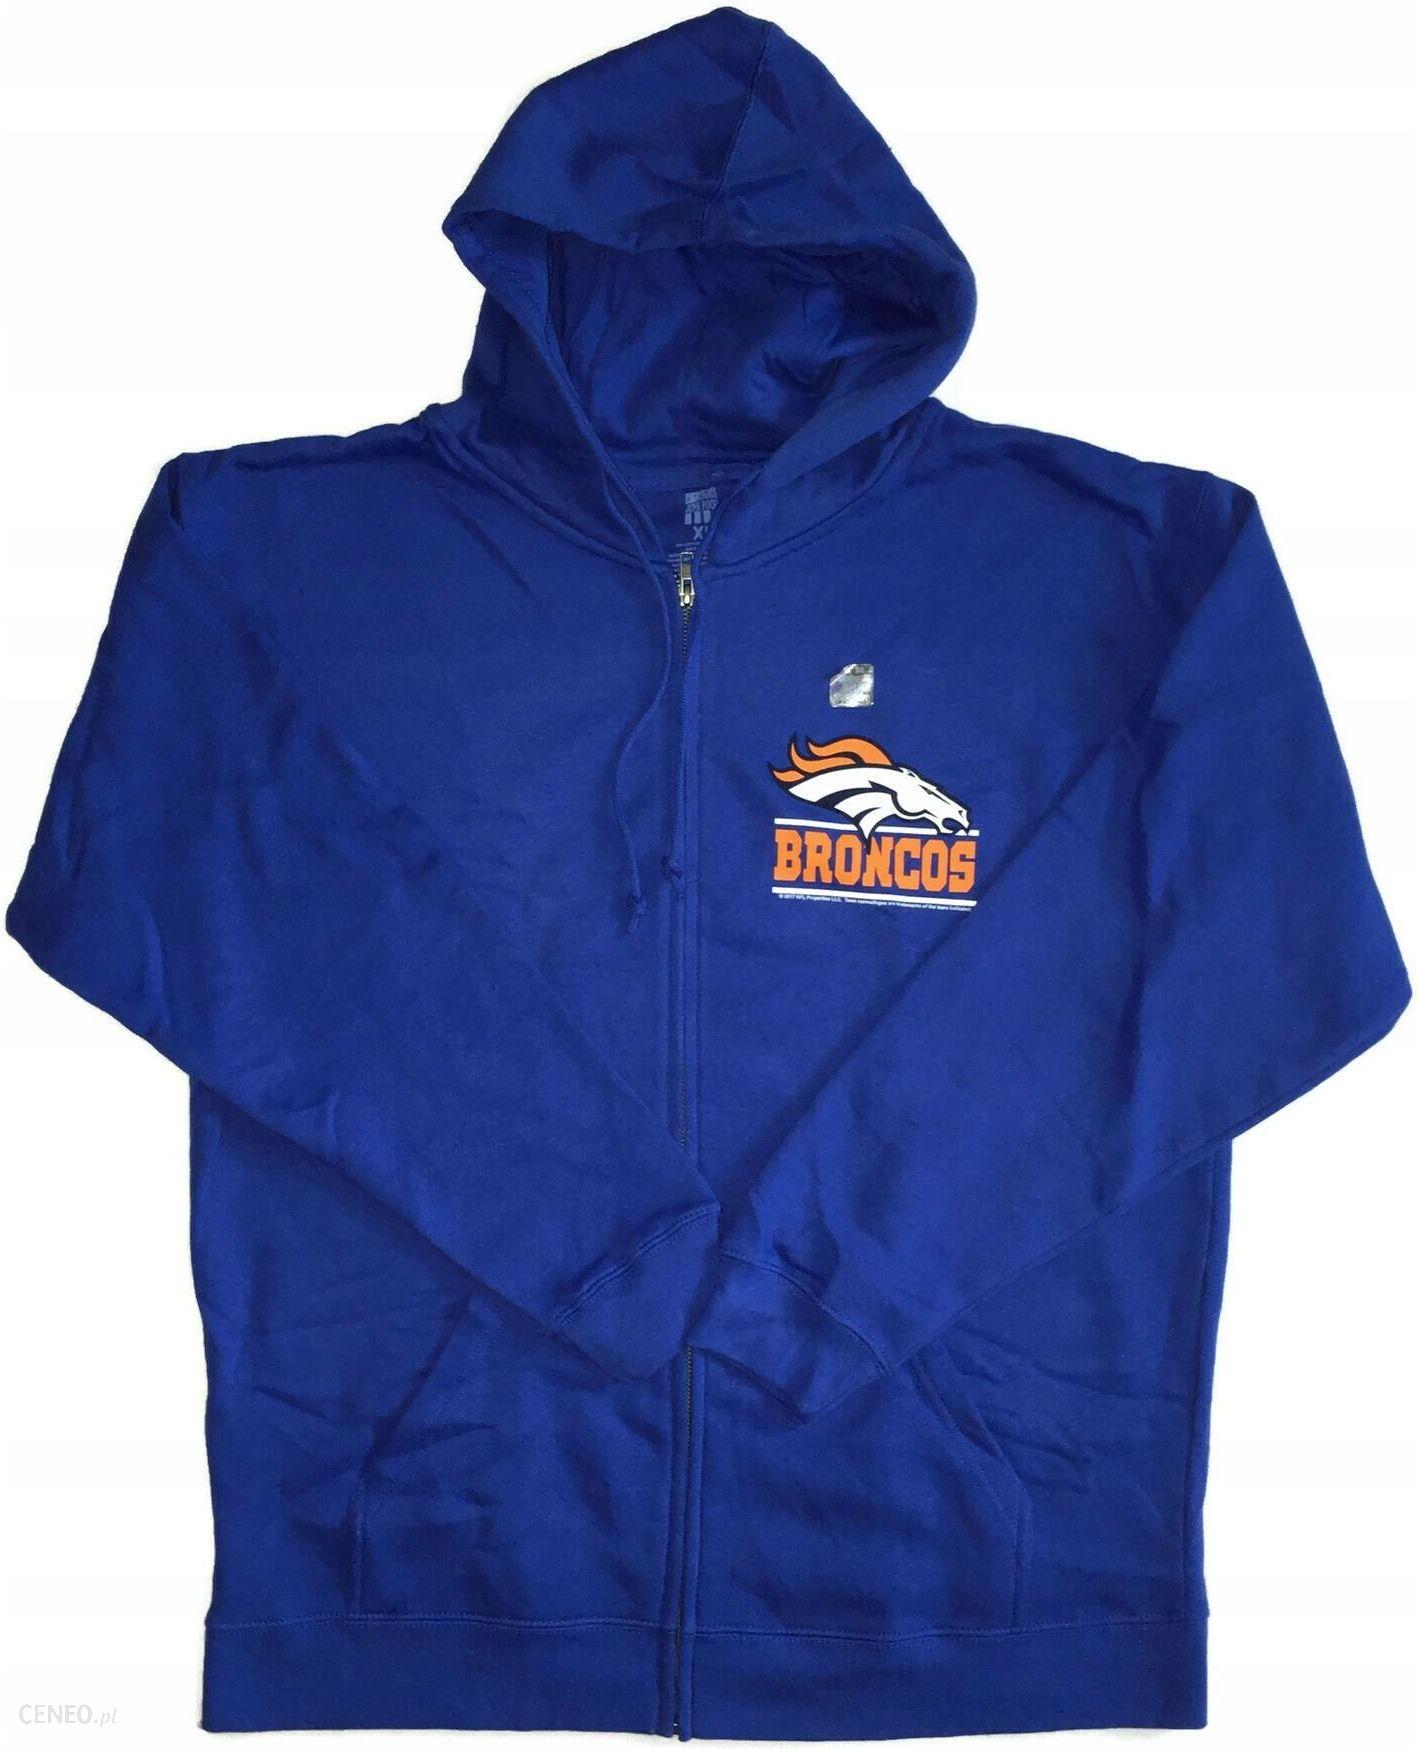 Bluza z kapturem Nfl Denver Broncos Junk Food XL + Ceny i opinie Ceneo.pl